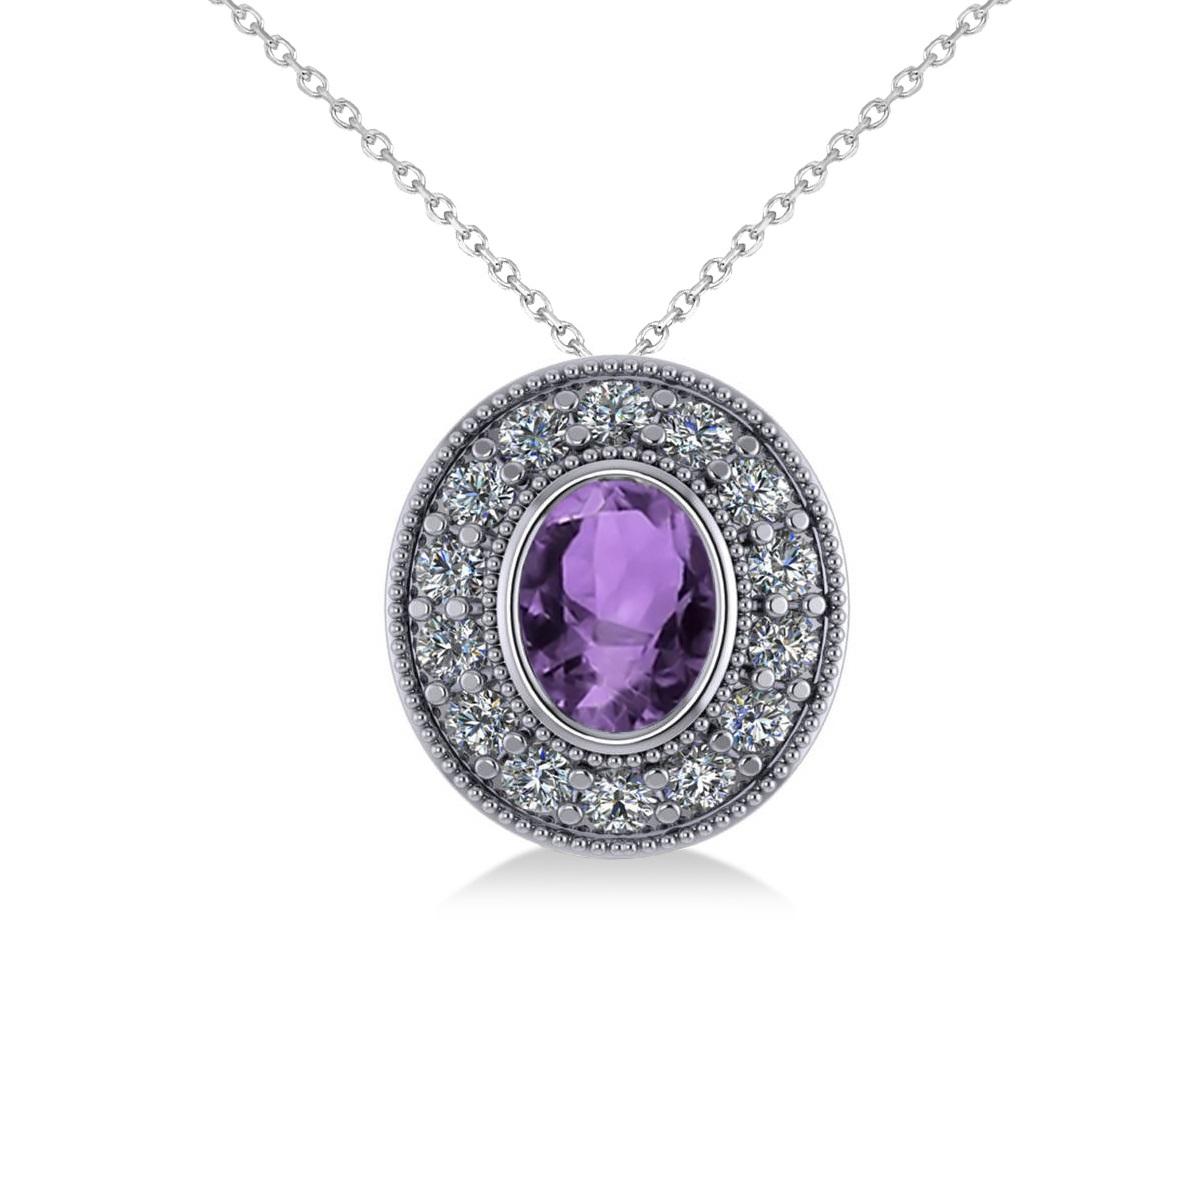 Amethyst & Diamond Halo Oval Pendant Necklace 14k White Gold (1.27ct)